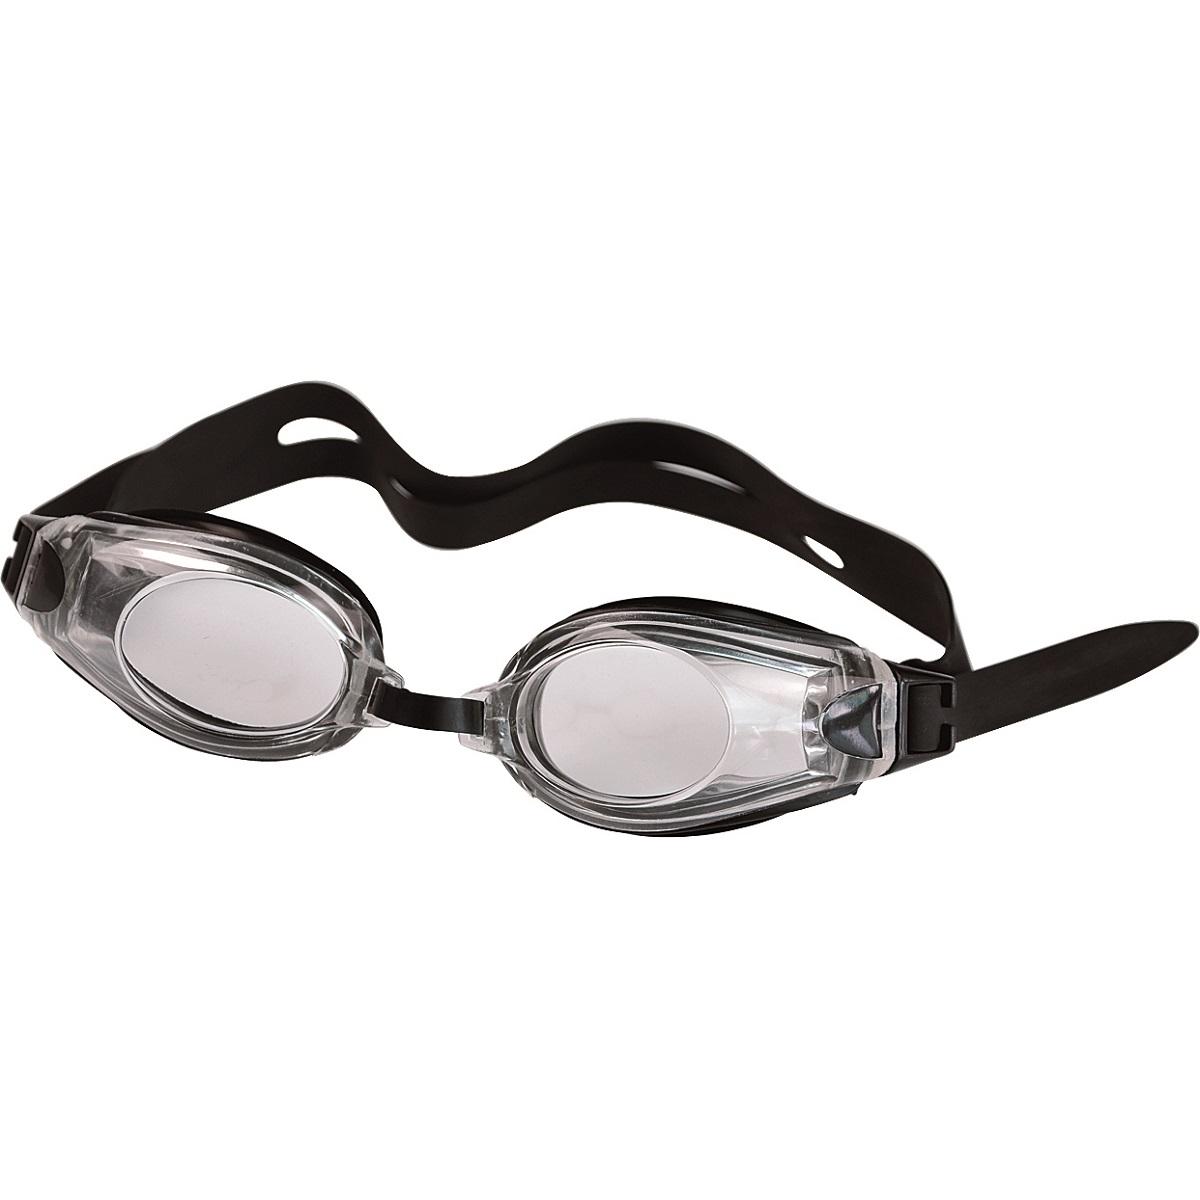 Detské plavecké okuliare Z-Ray 516 - čierne